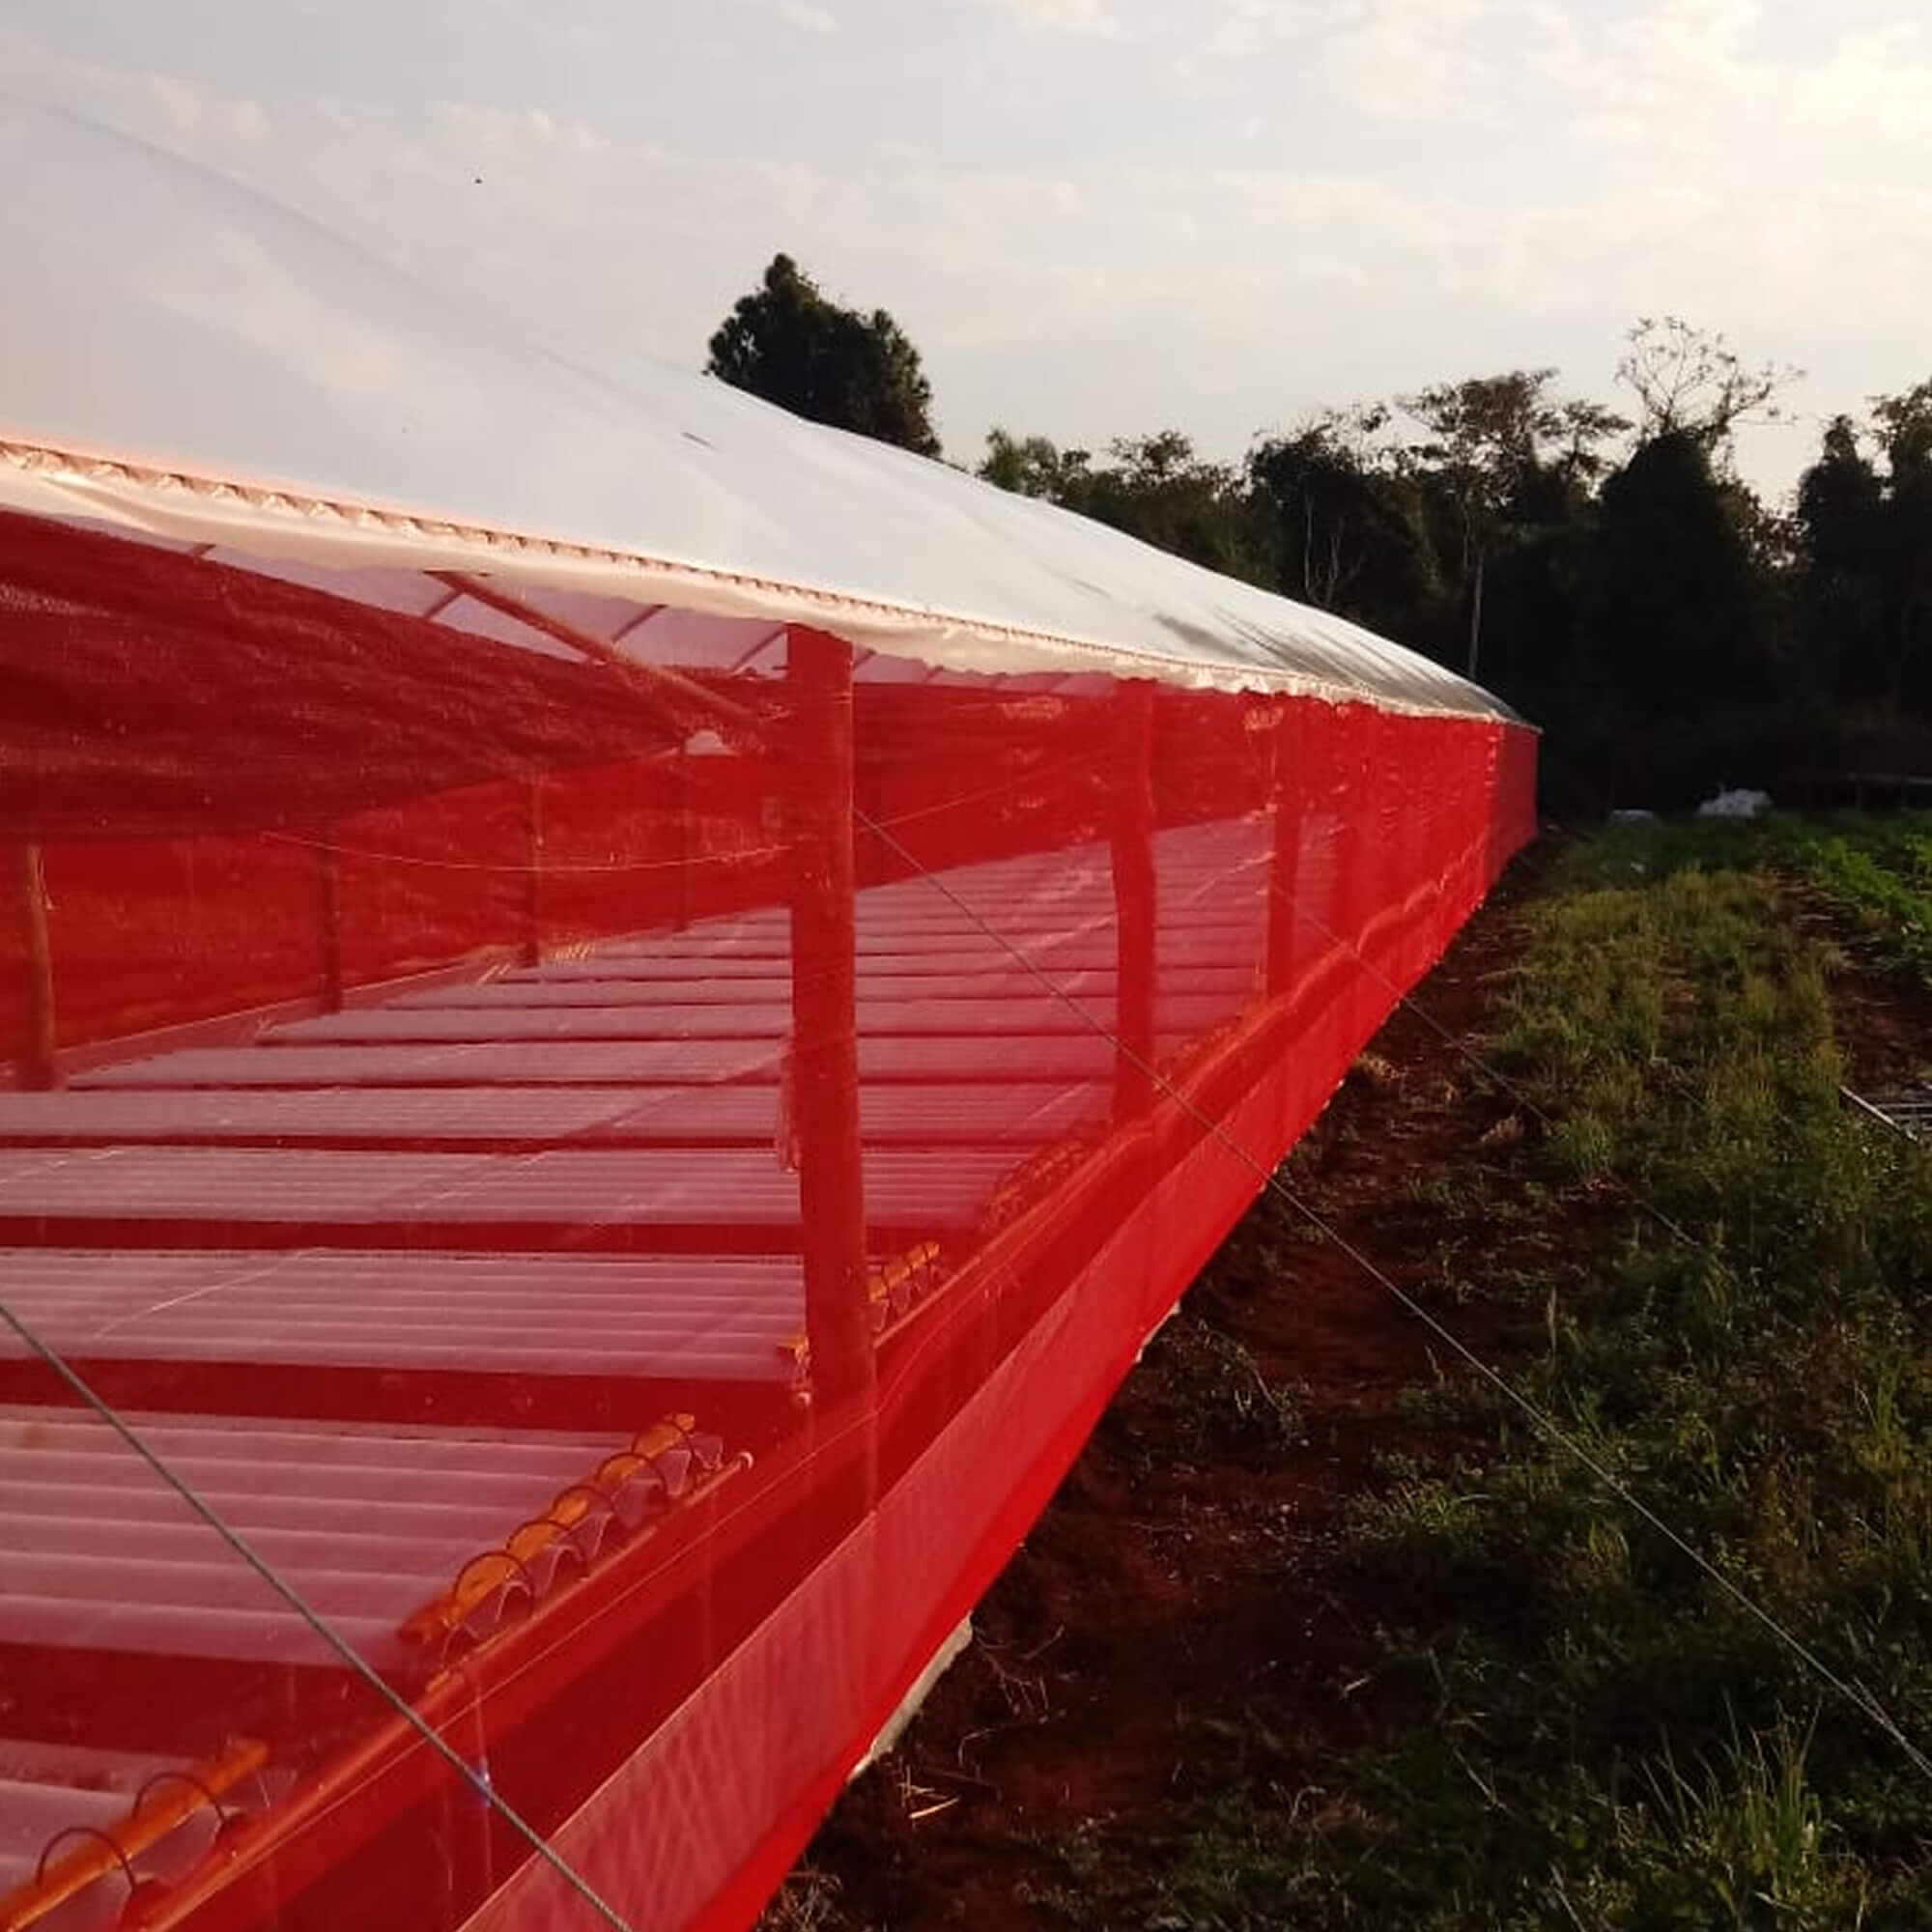 Tela de Sombreamento Vermelha 20% - 4,15 metros